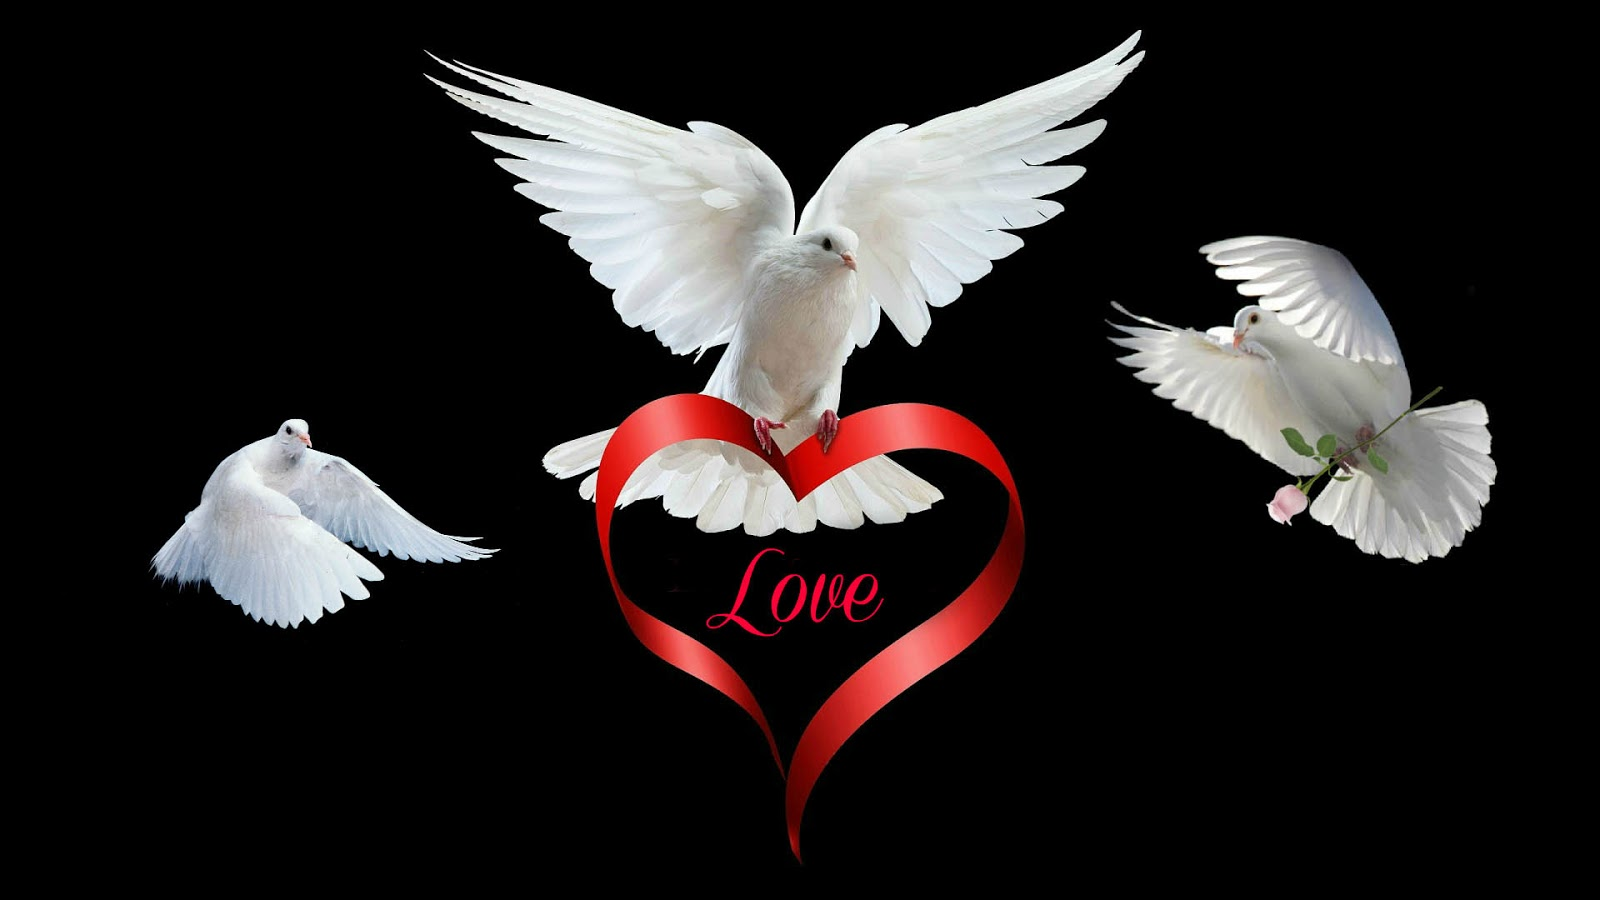 Love Wallpaper - Oriya Entertainment & News